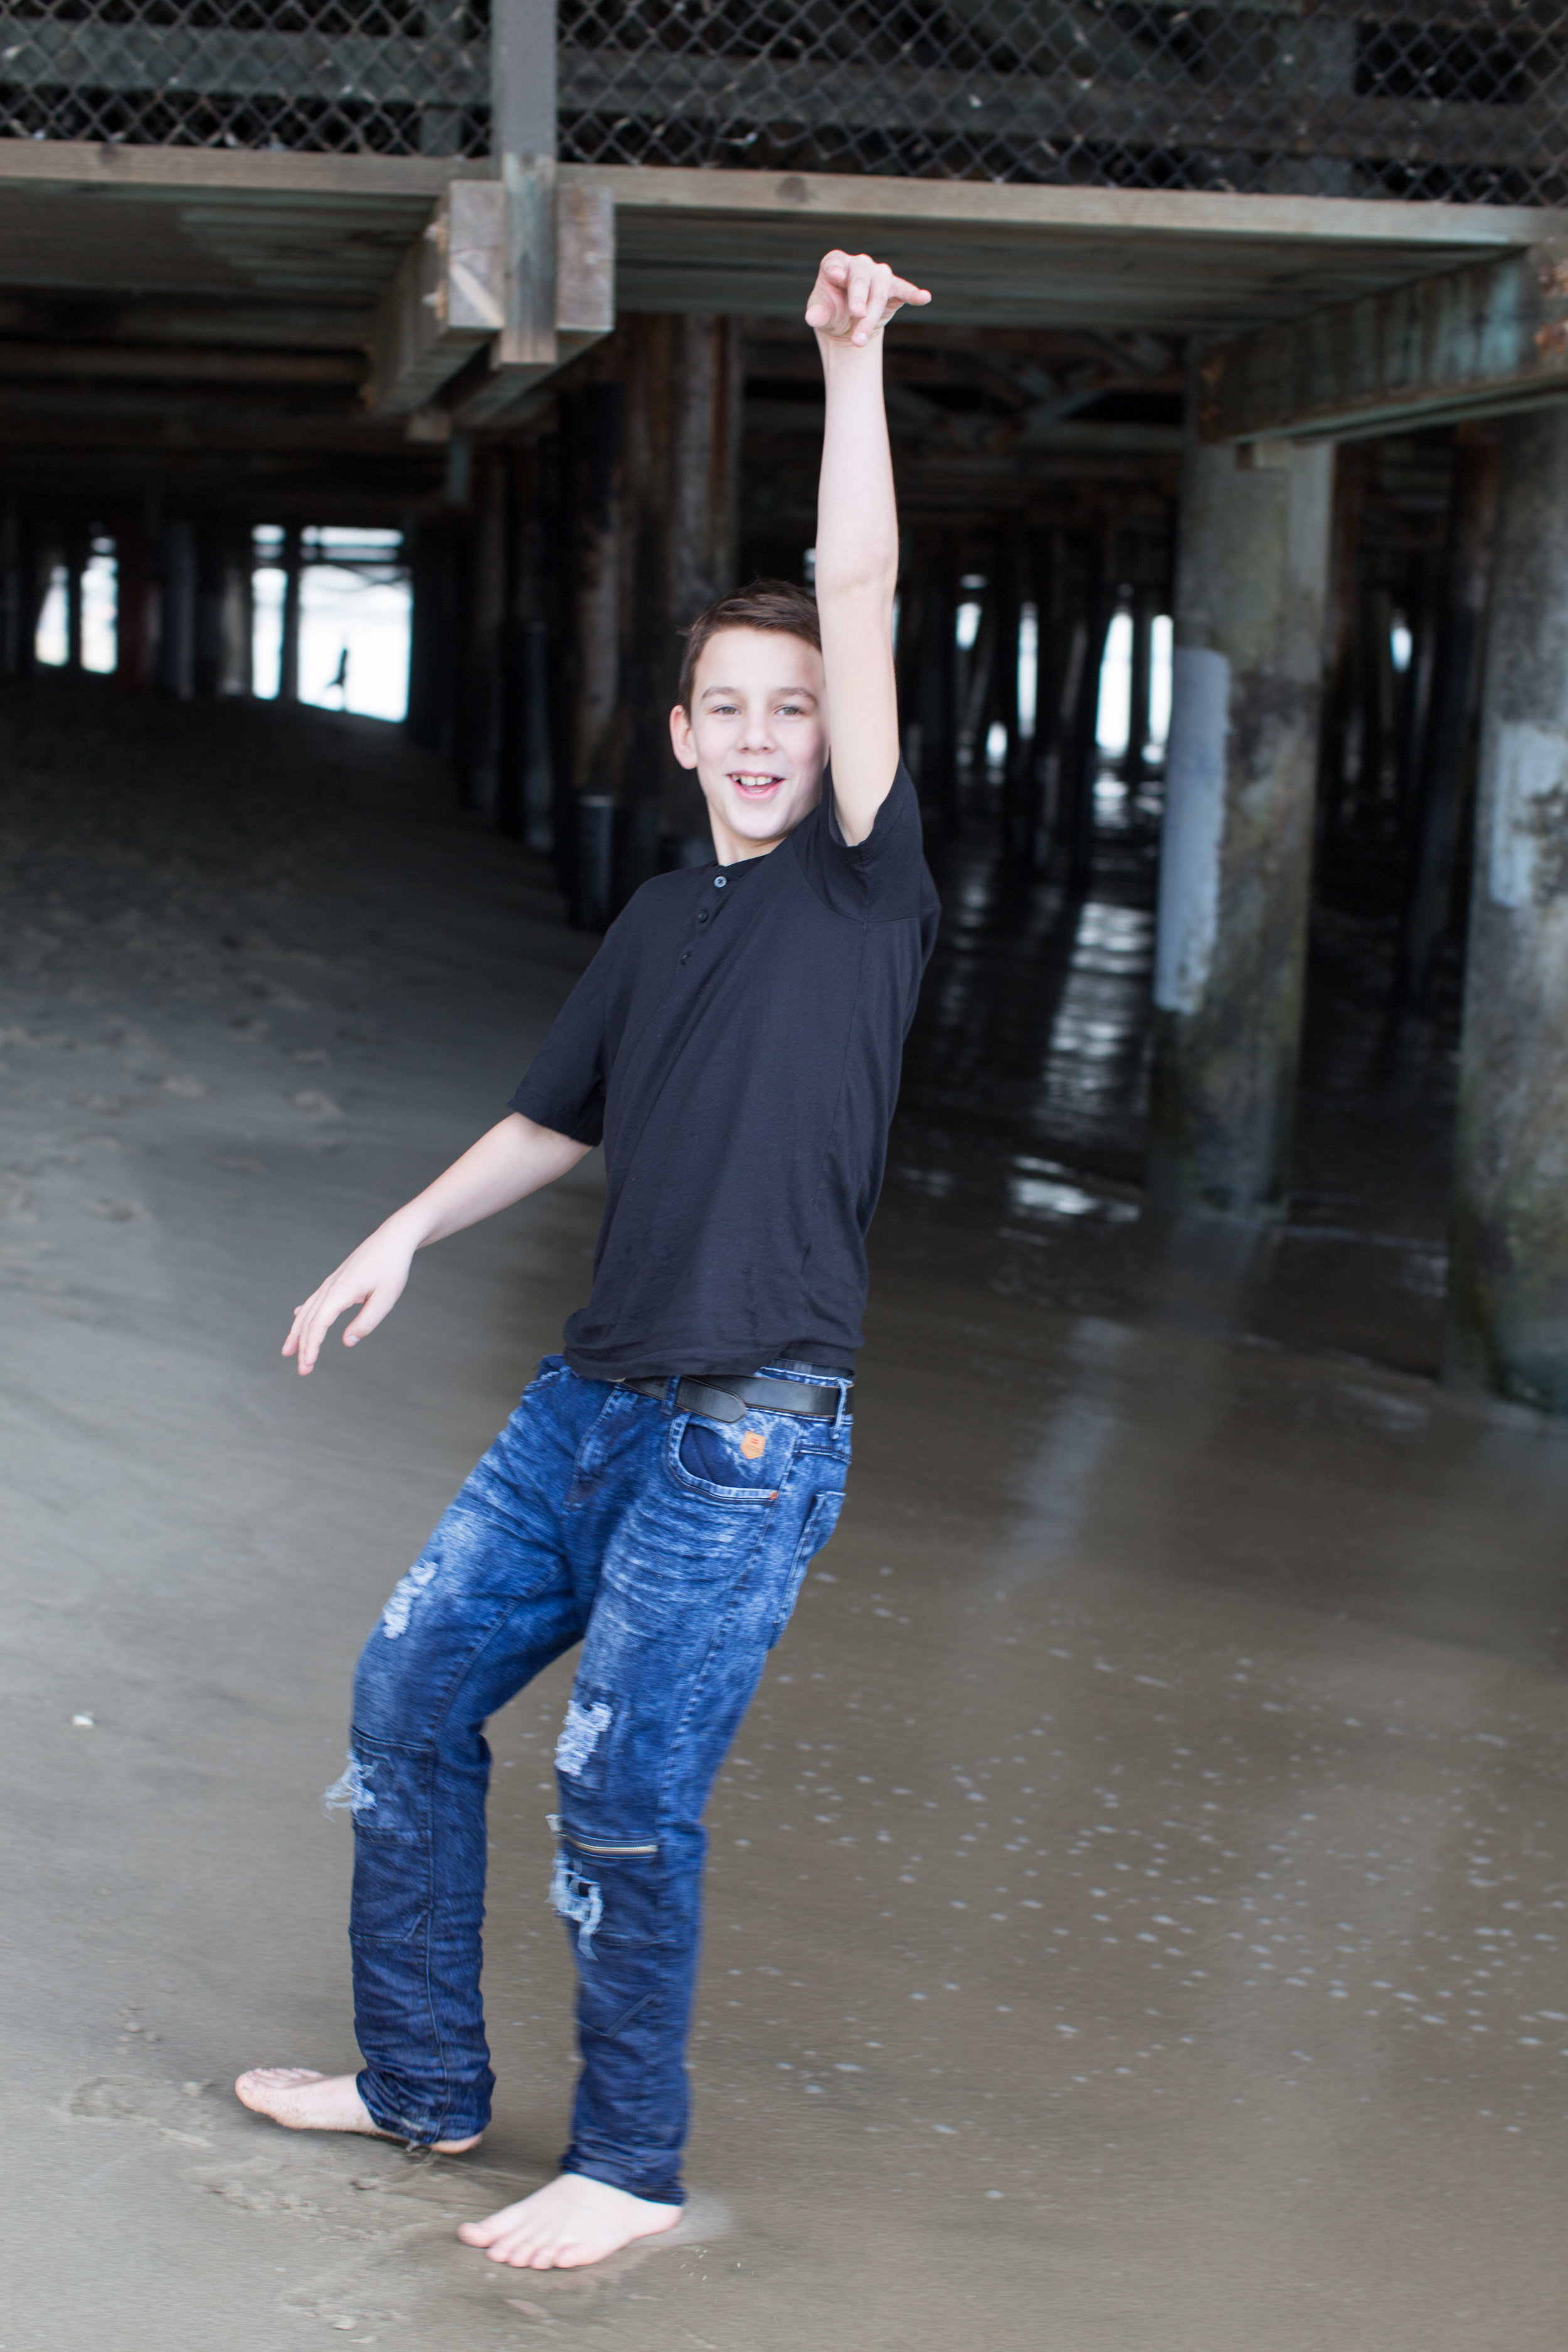 Chelsea Santa Monica Pier - 12.23.17 Selects (31 of 32).jpg